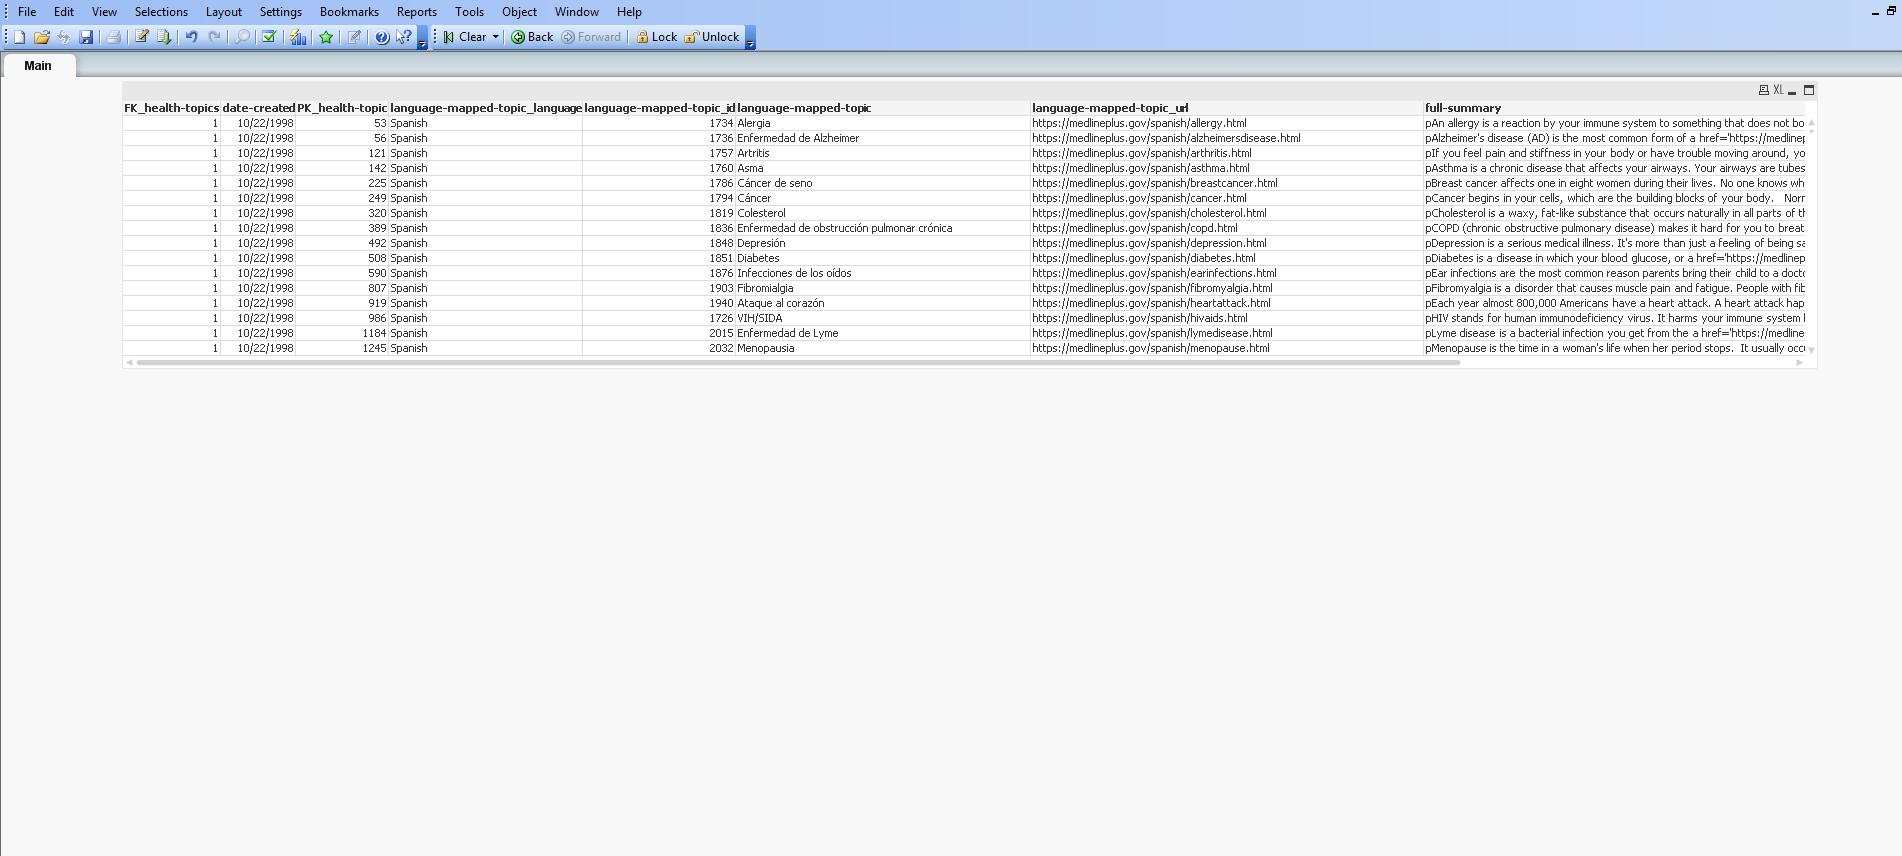 Converting MedlinePlus XML to QlikView - Sonra